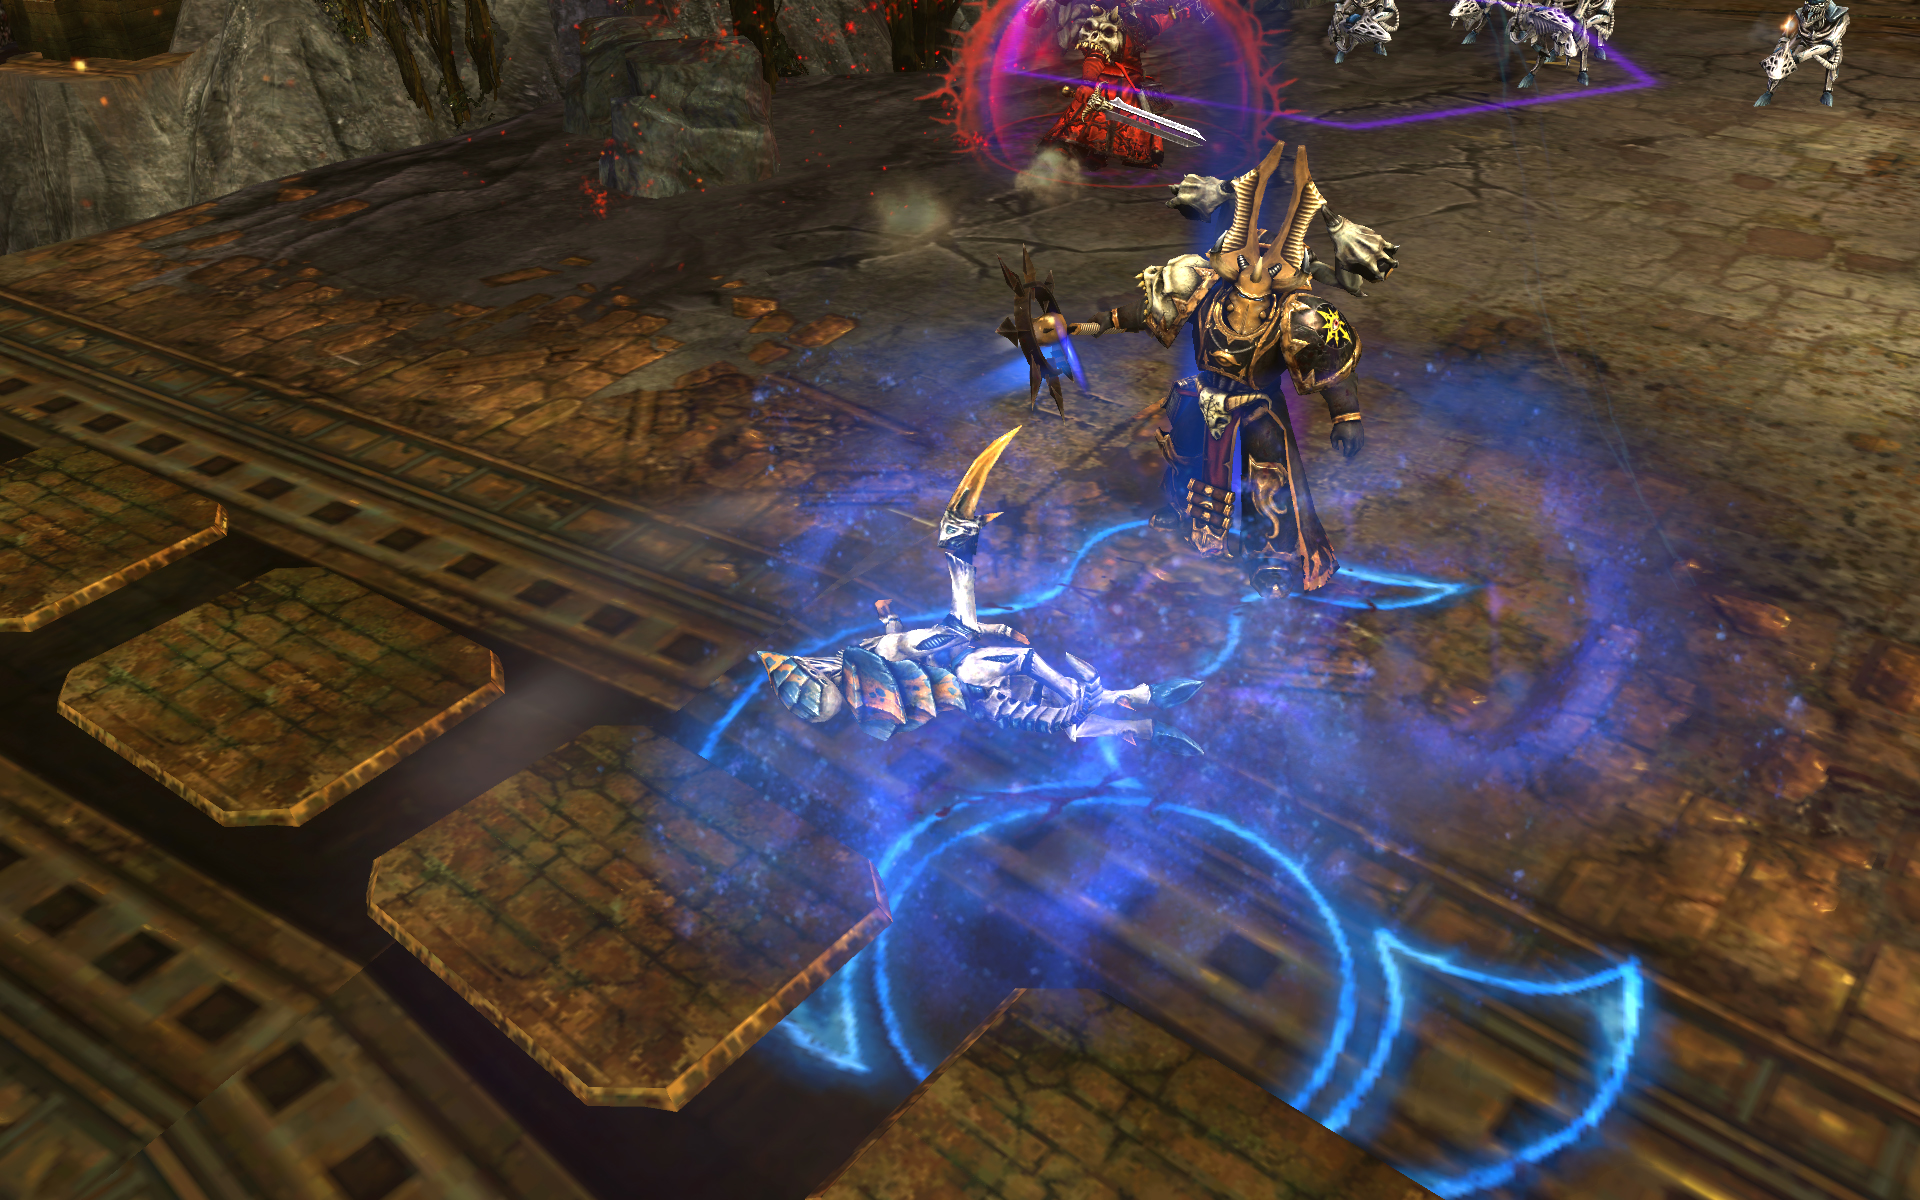 Warhammer 40,000: Dawn of War II - Retribution - Chaos Sorcerer Wargear DLC screenshot